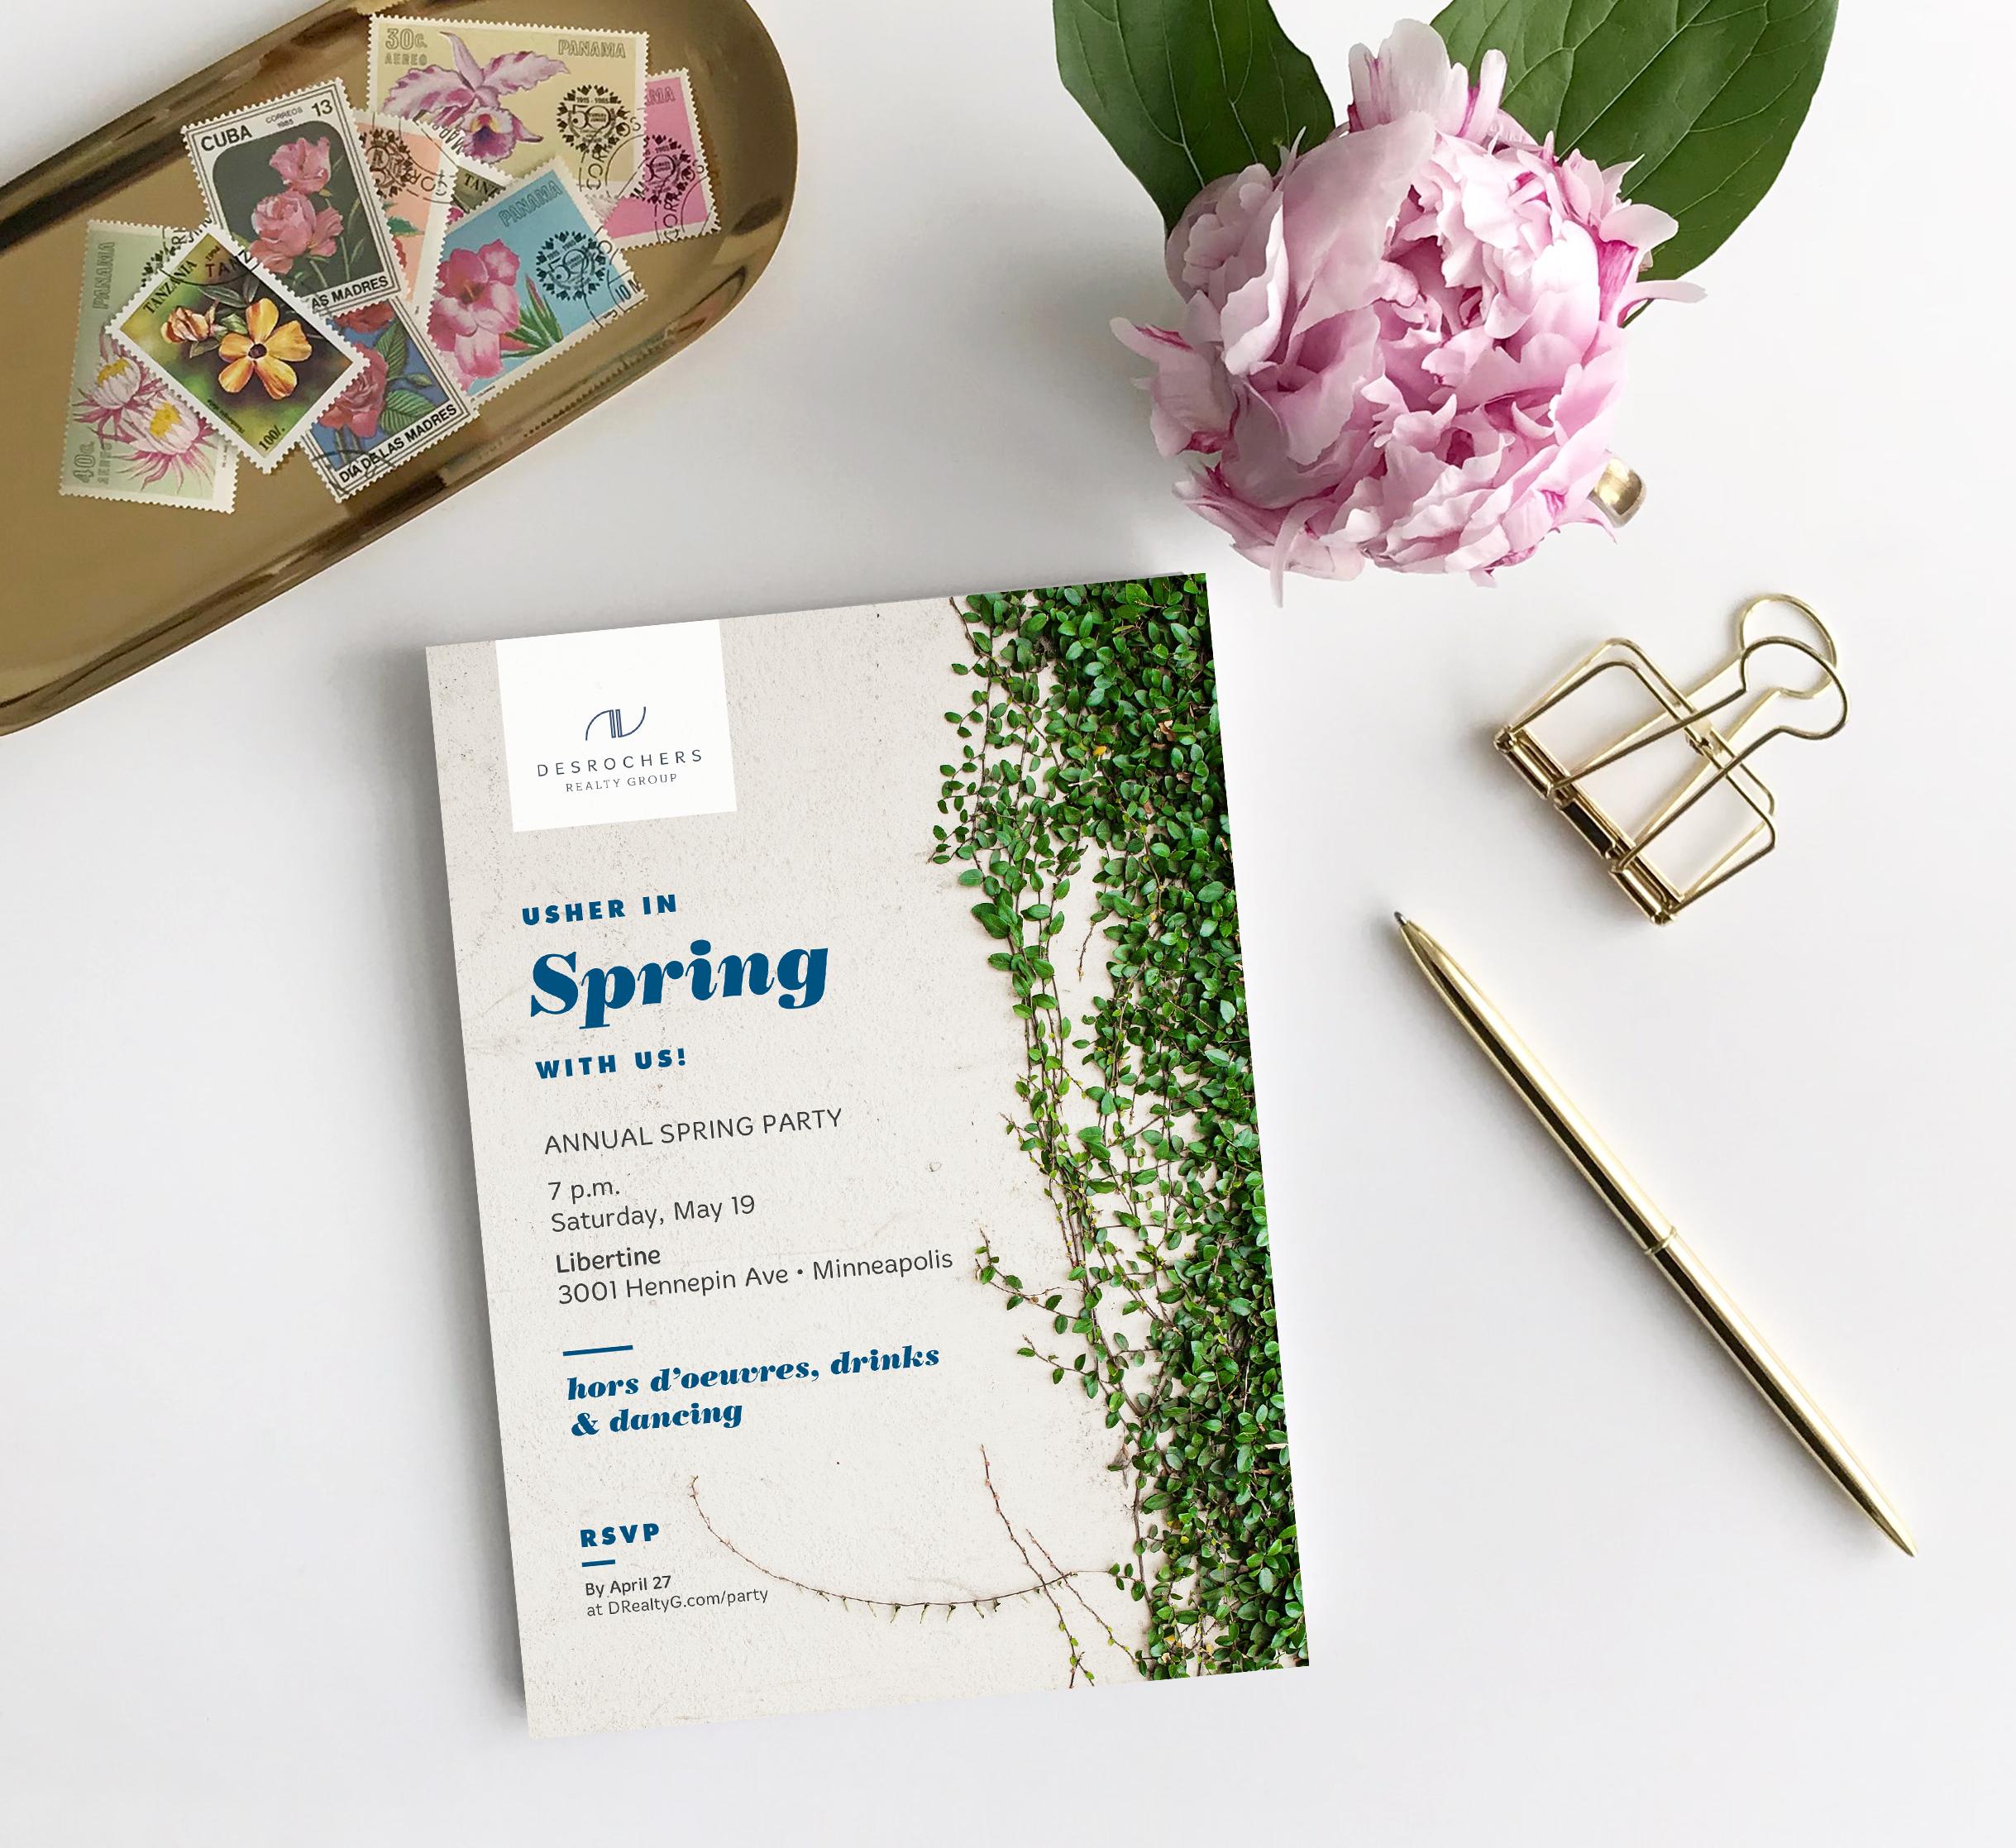 Spring Invitation | Desrochers Realty Group